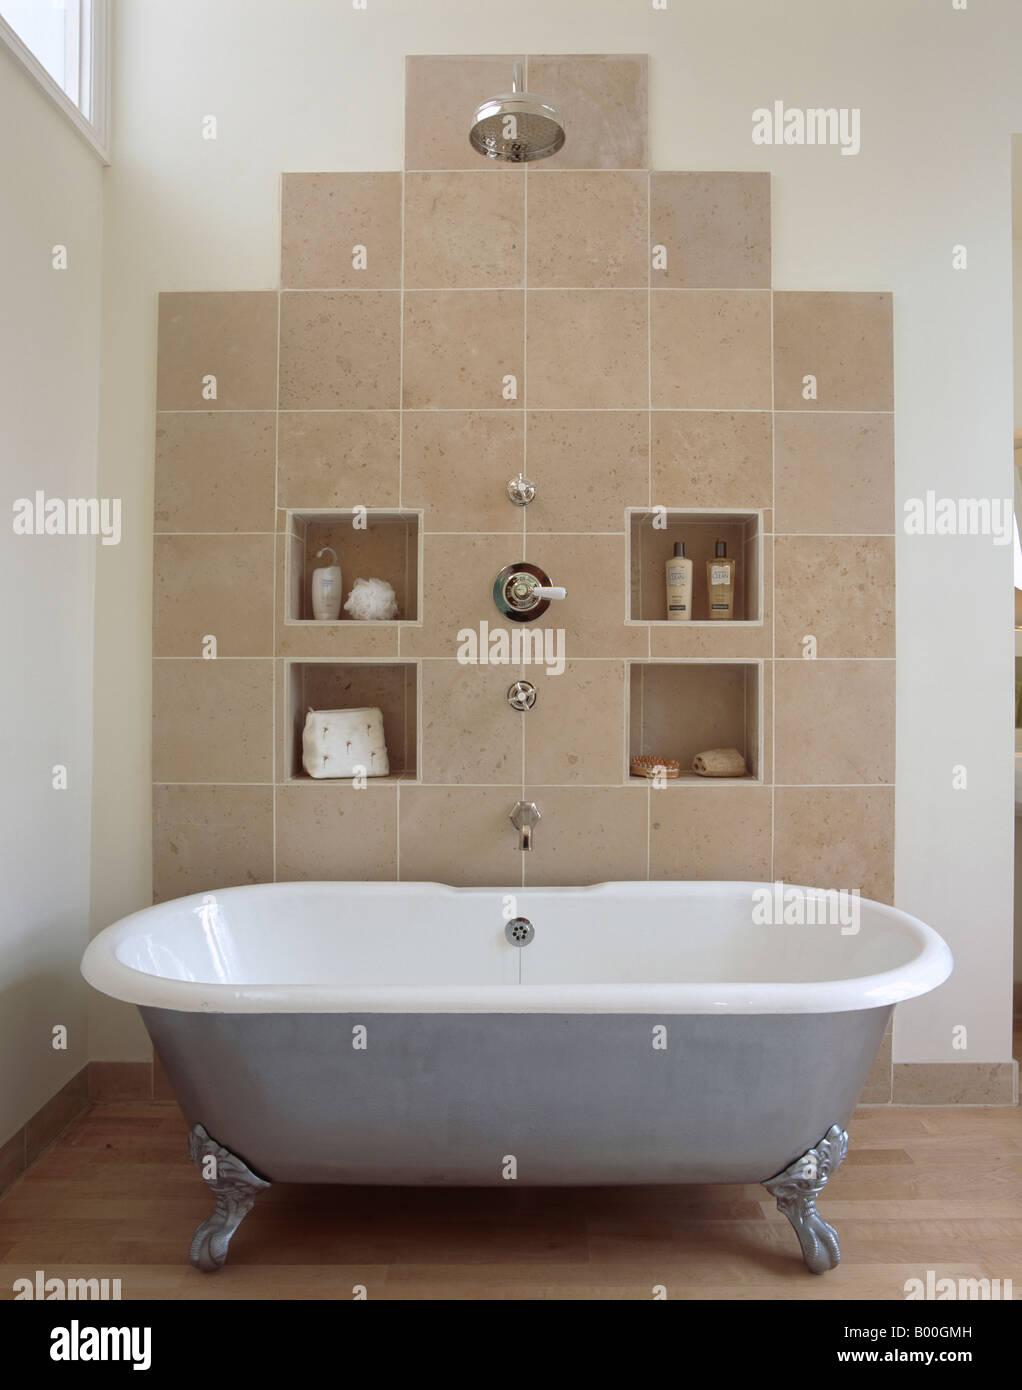 Large Chrome Showerhead Above Metallic Clawfoot Bath In Modern Bathroom  With Alcove Storage On Beige Tiled Wall